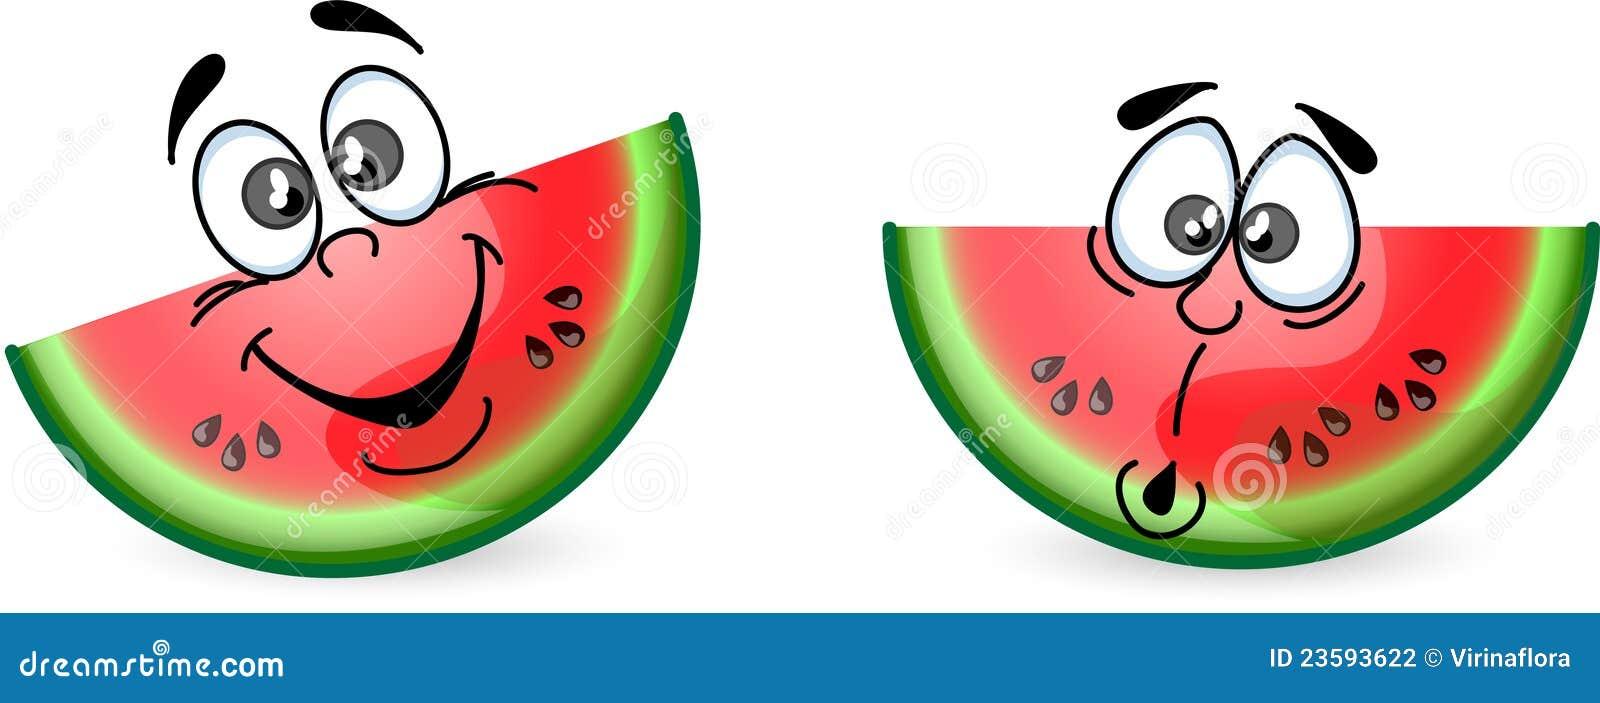 Cartoon Watermelon,vector Stock Photography